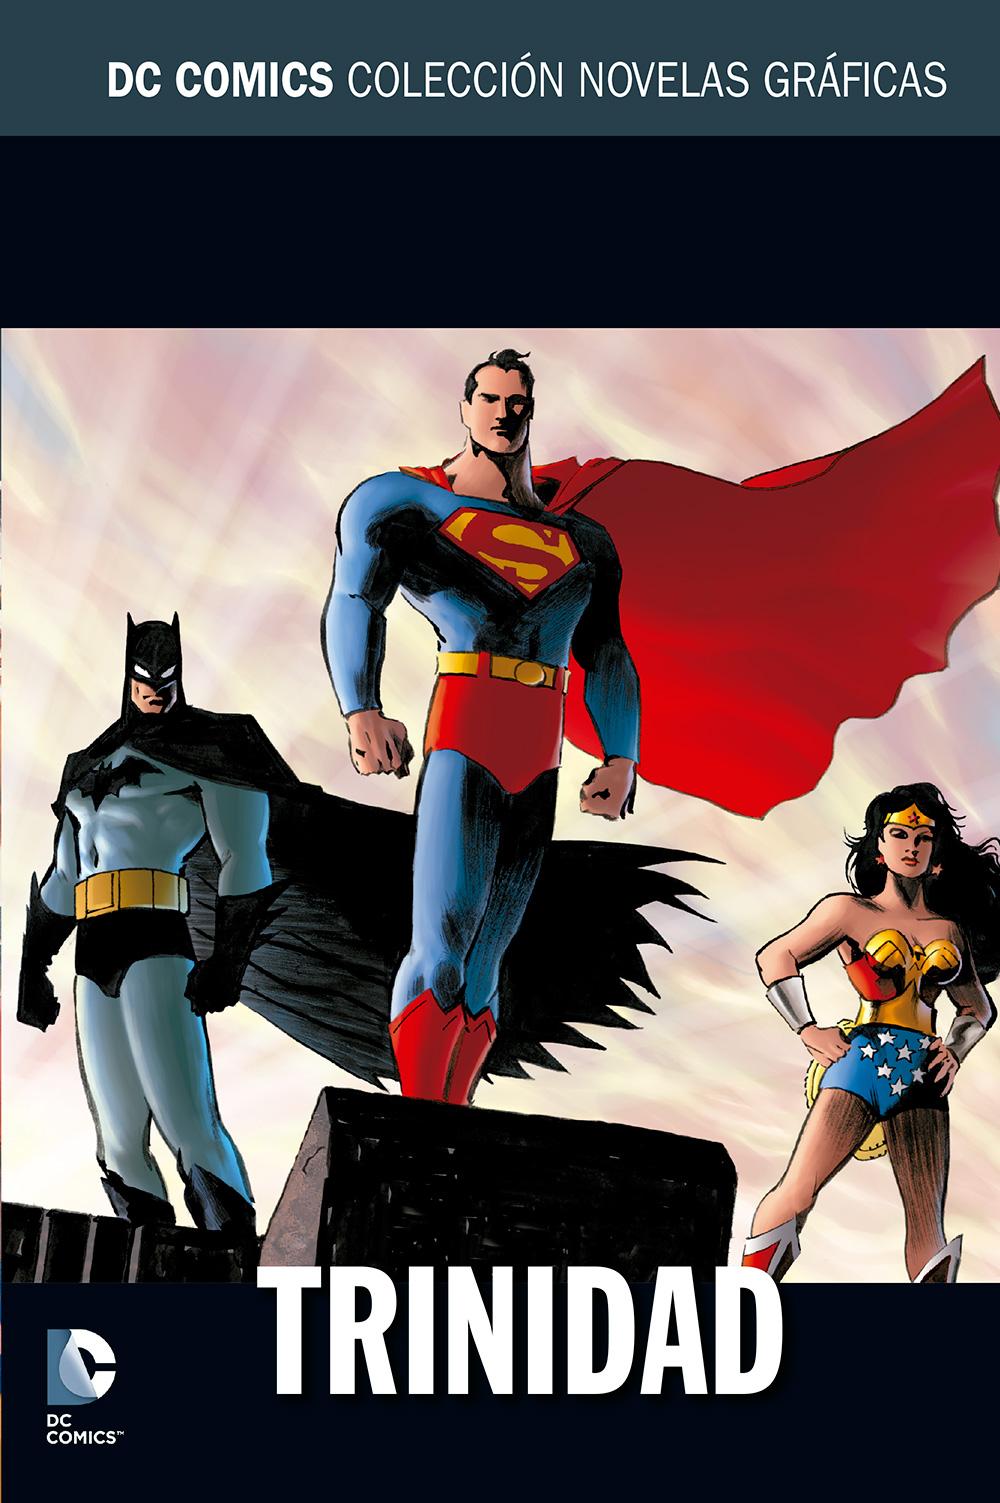 41-44 - [DC - Salvat] La Colección de Novelas Gráficas de DC Comics  SF118_025_01_001